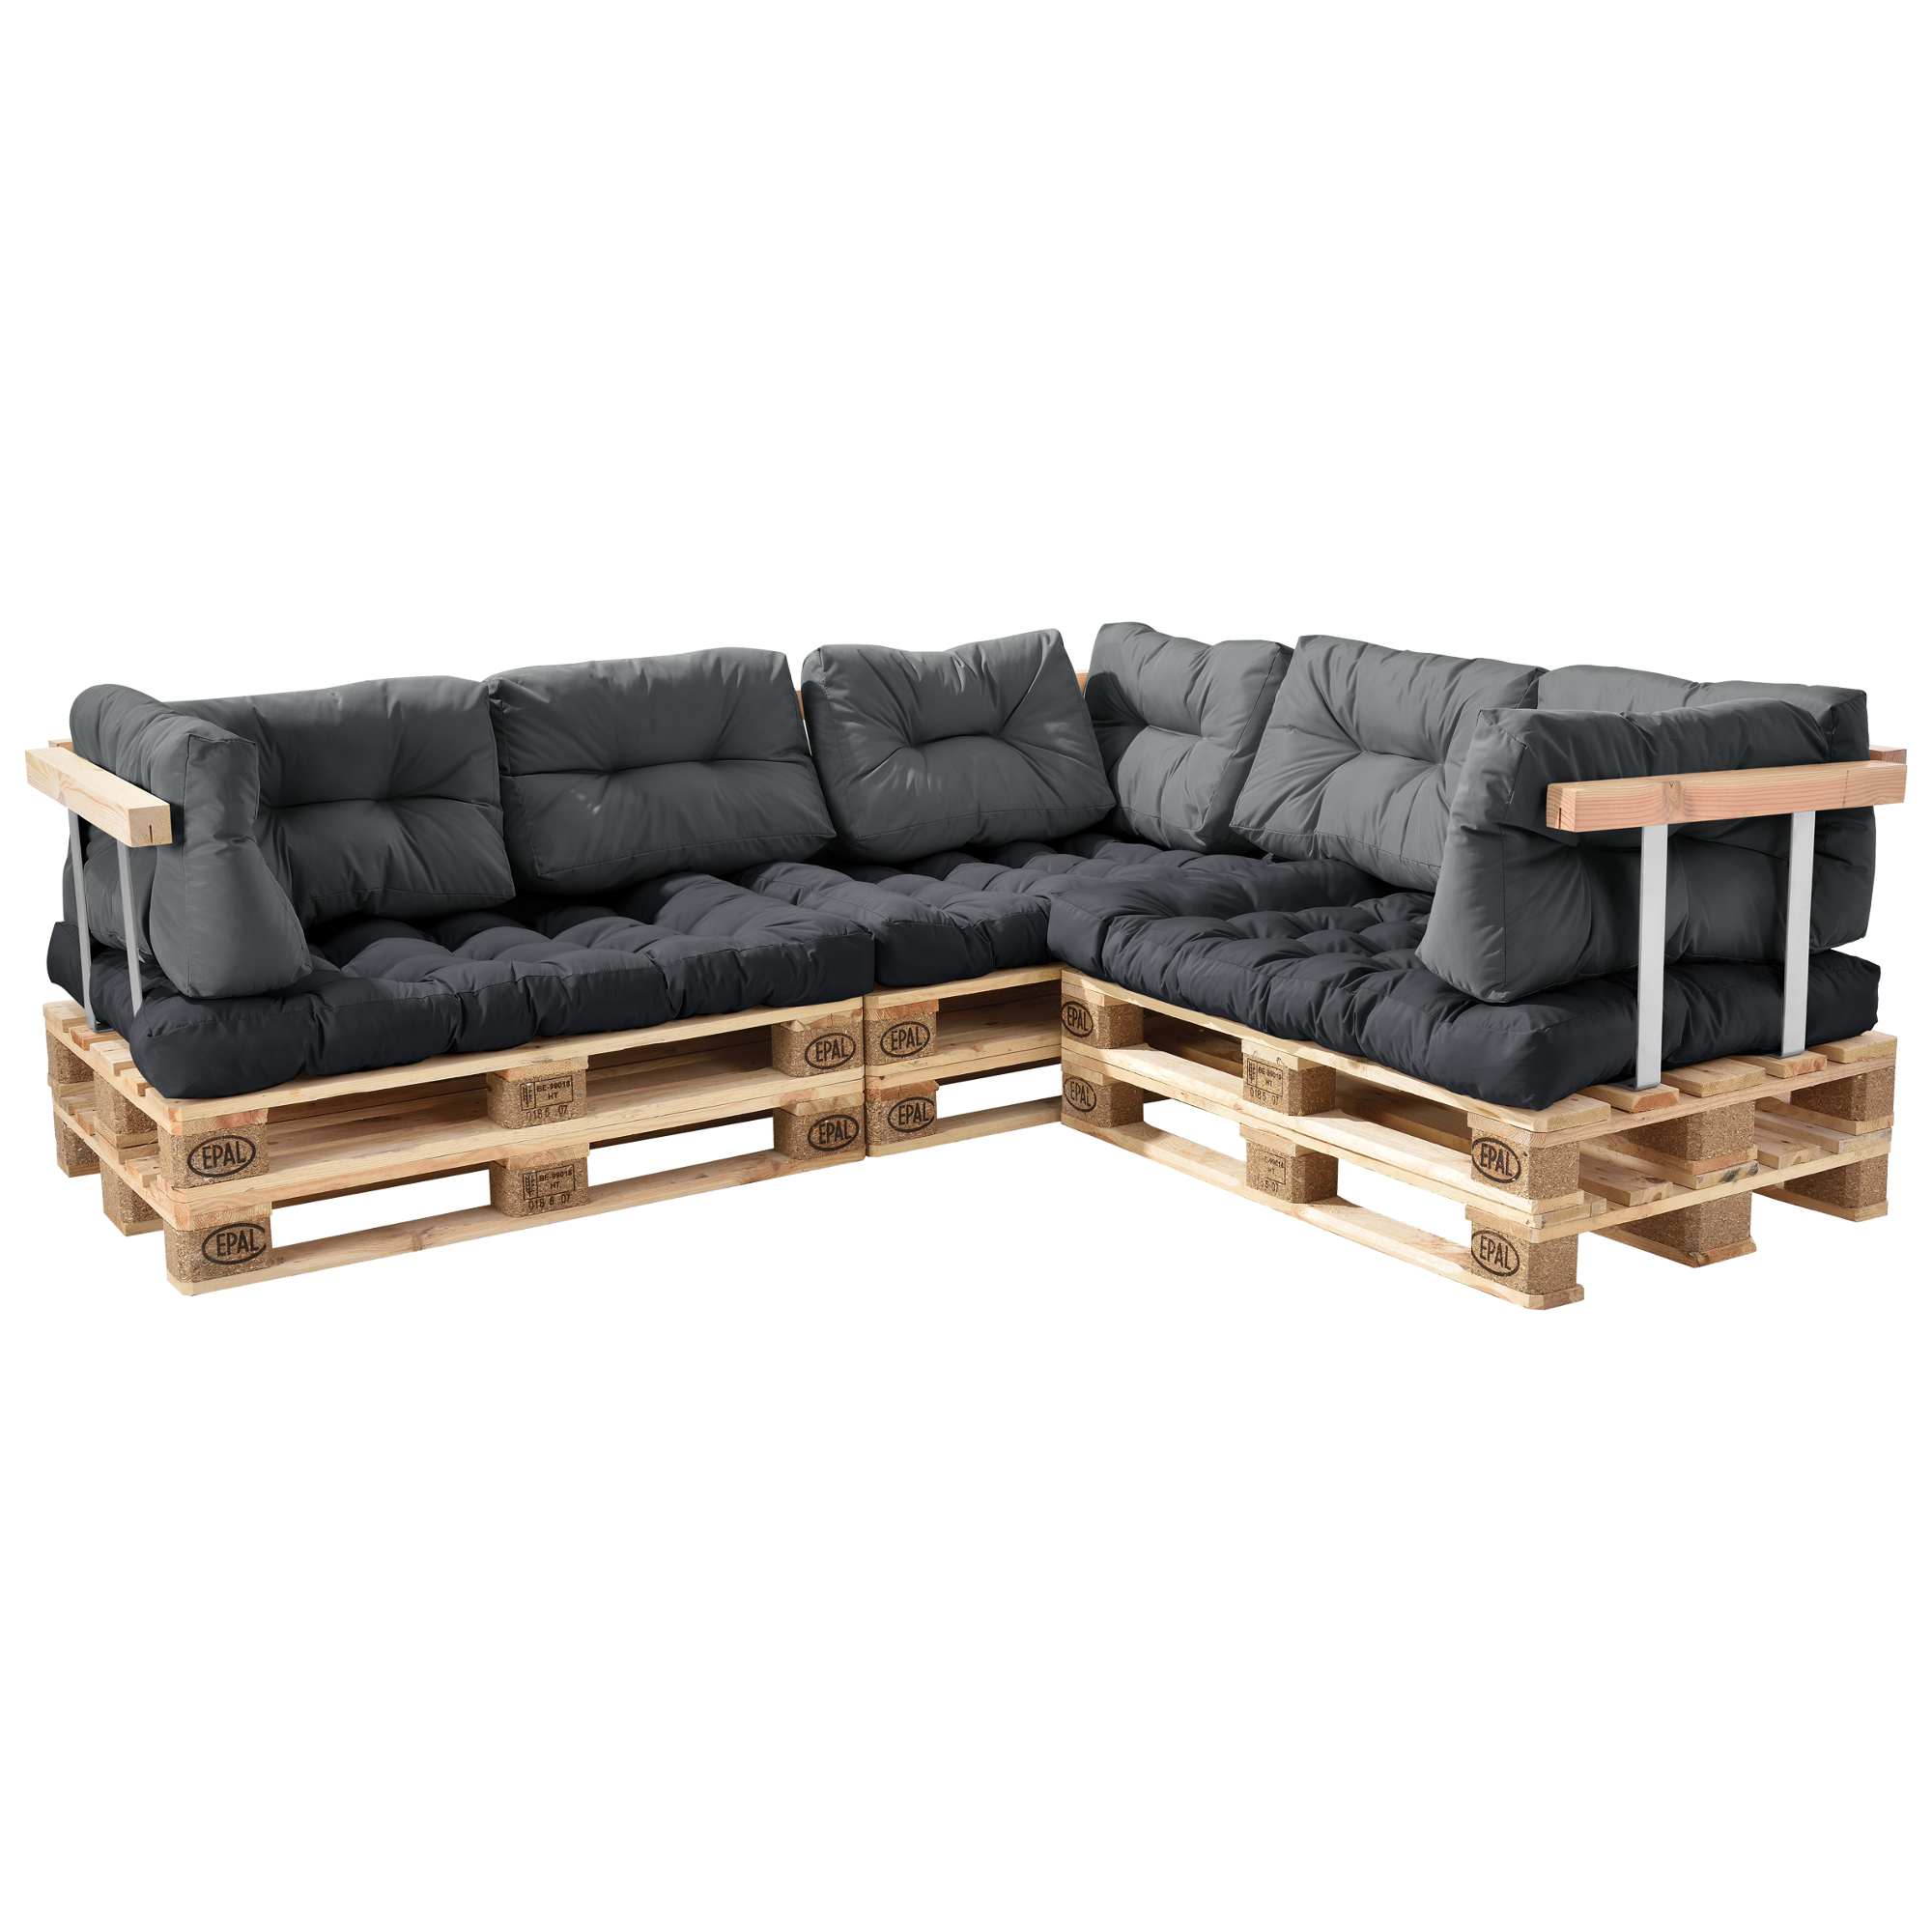 En Casa 174 Palettenkissen In Outdoor Paletten Kissen Sofa